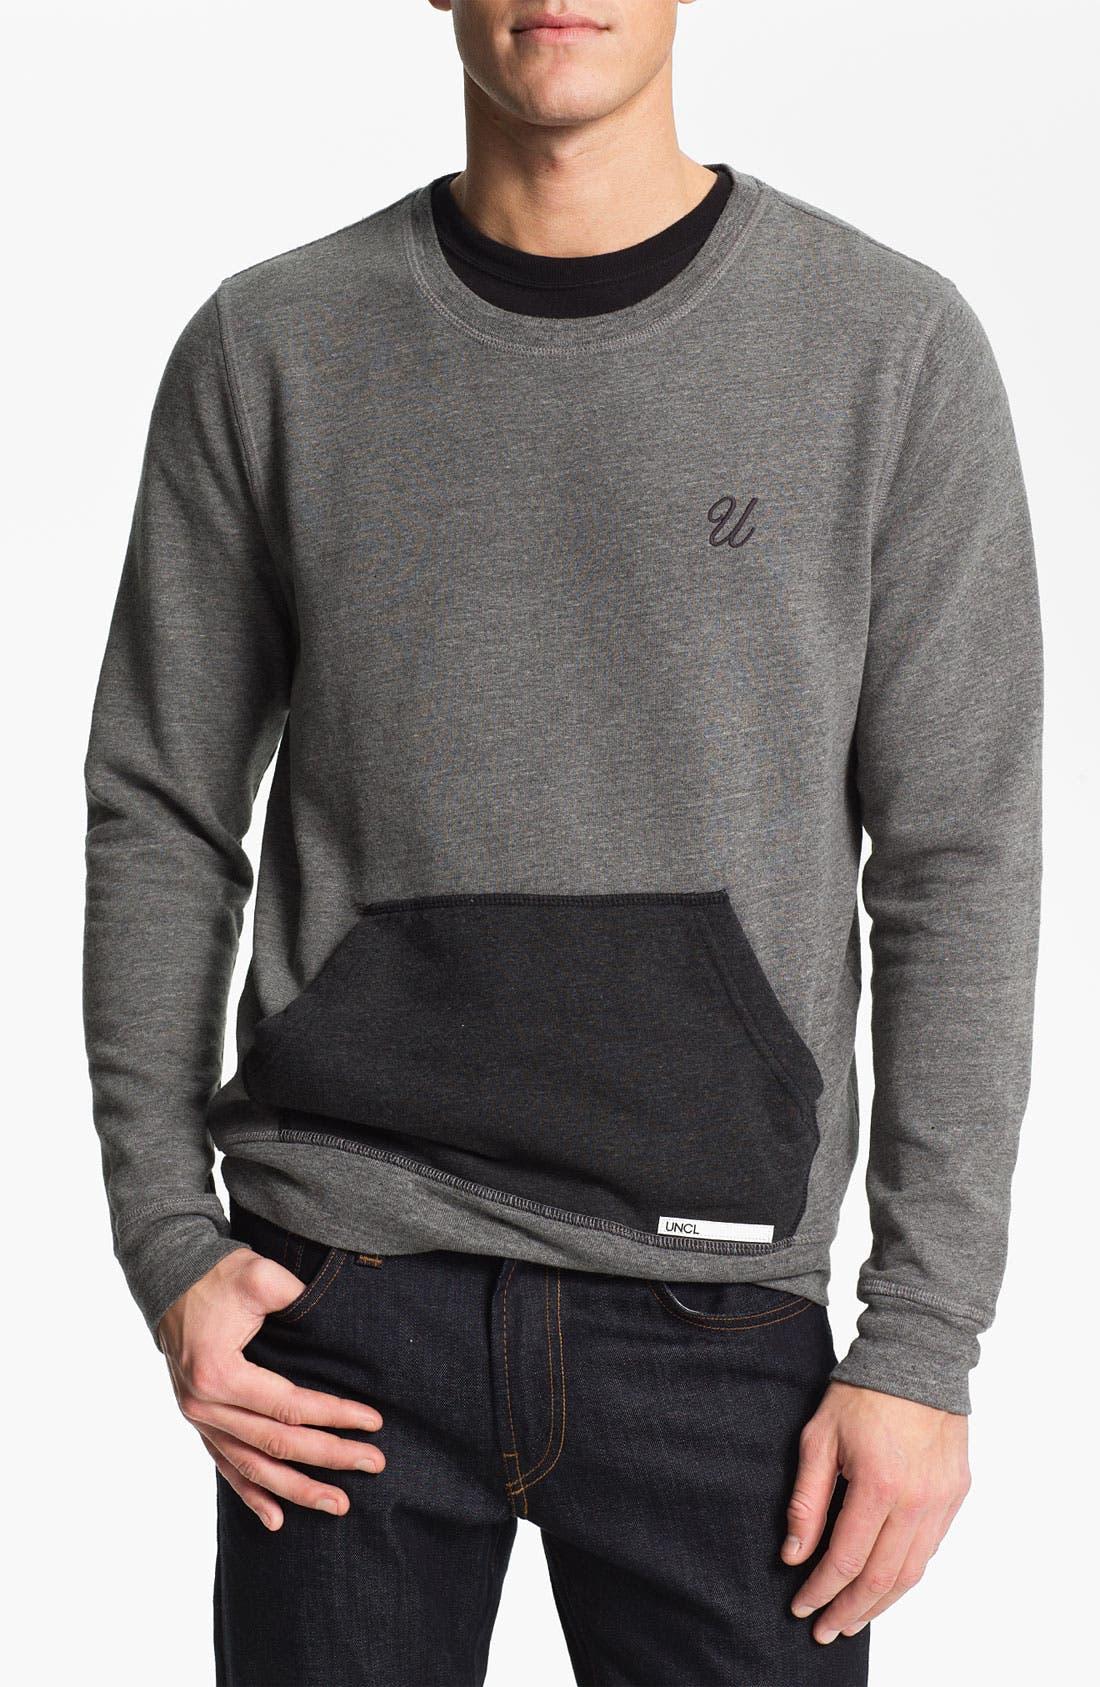 Main Image - UNCL Crewneck Fleece Sweatshirt